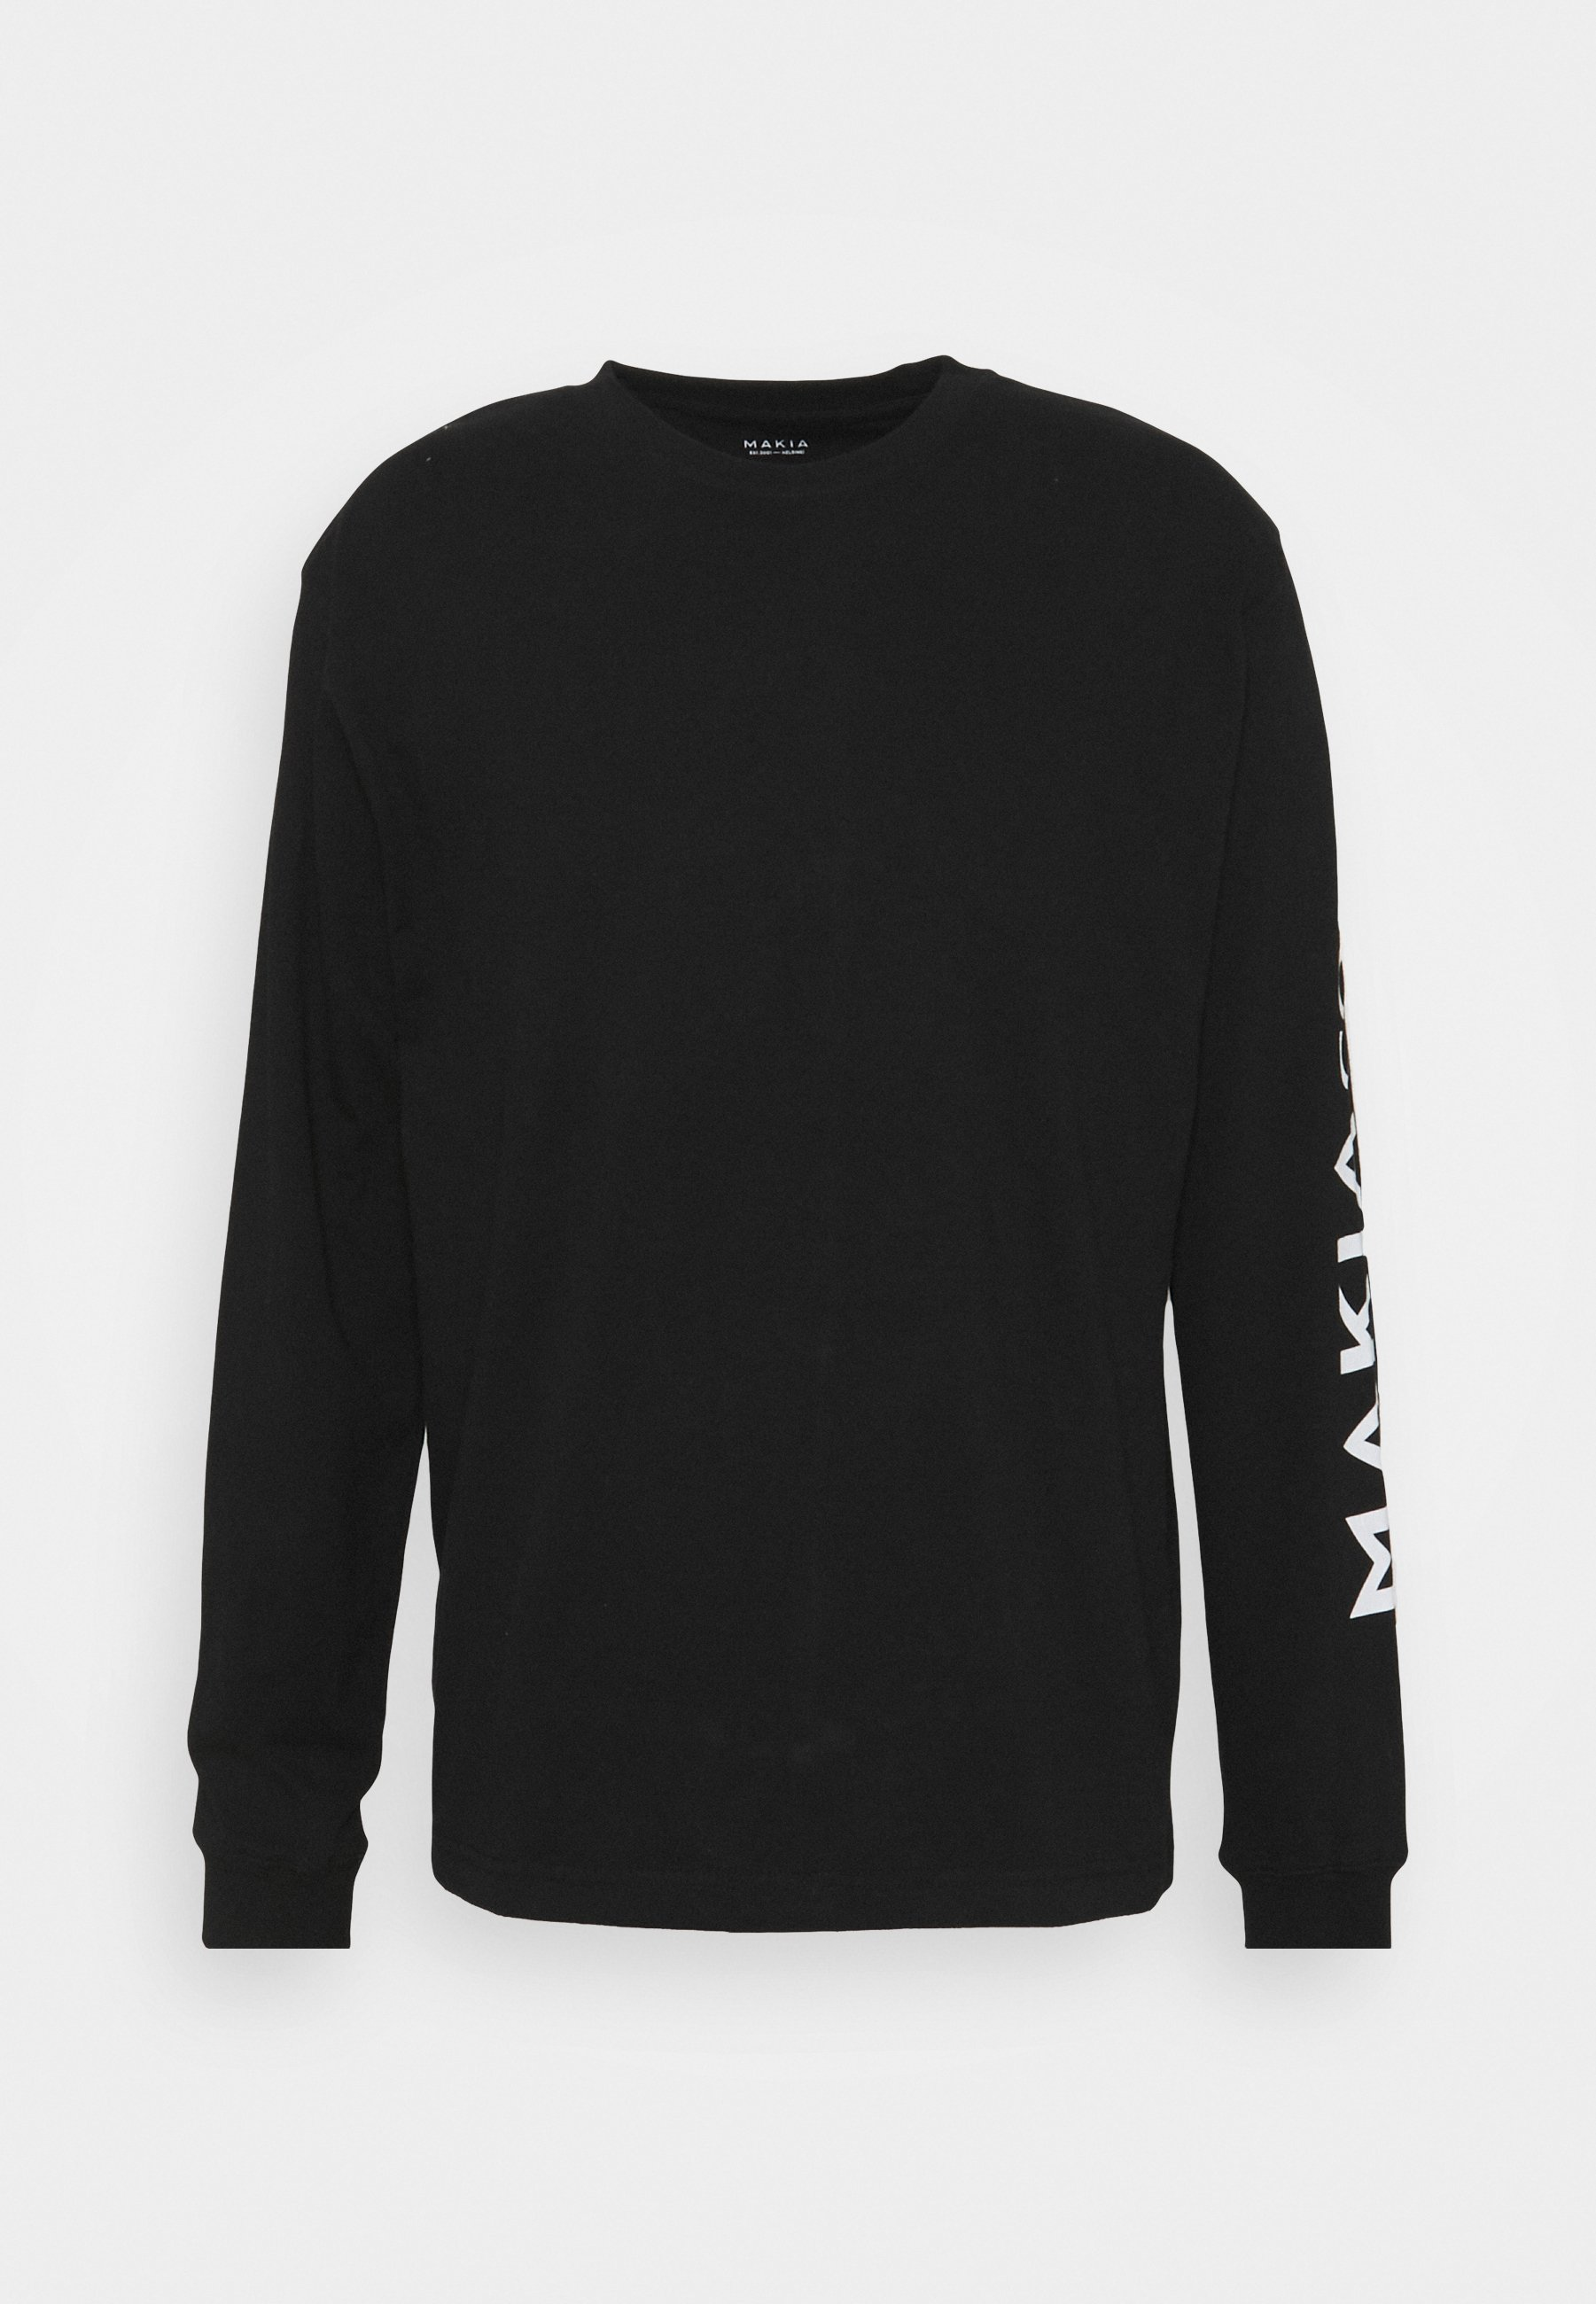 Uomo NUUK LONG SLEEVE - Maglietta a manica lunga